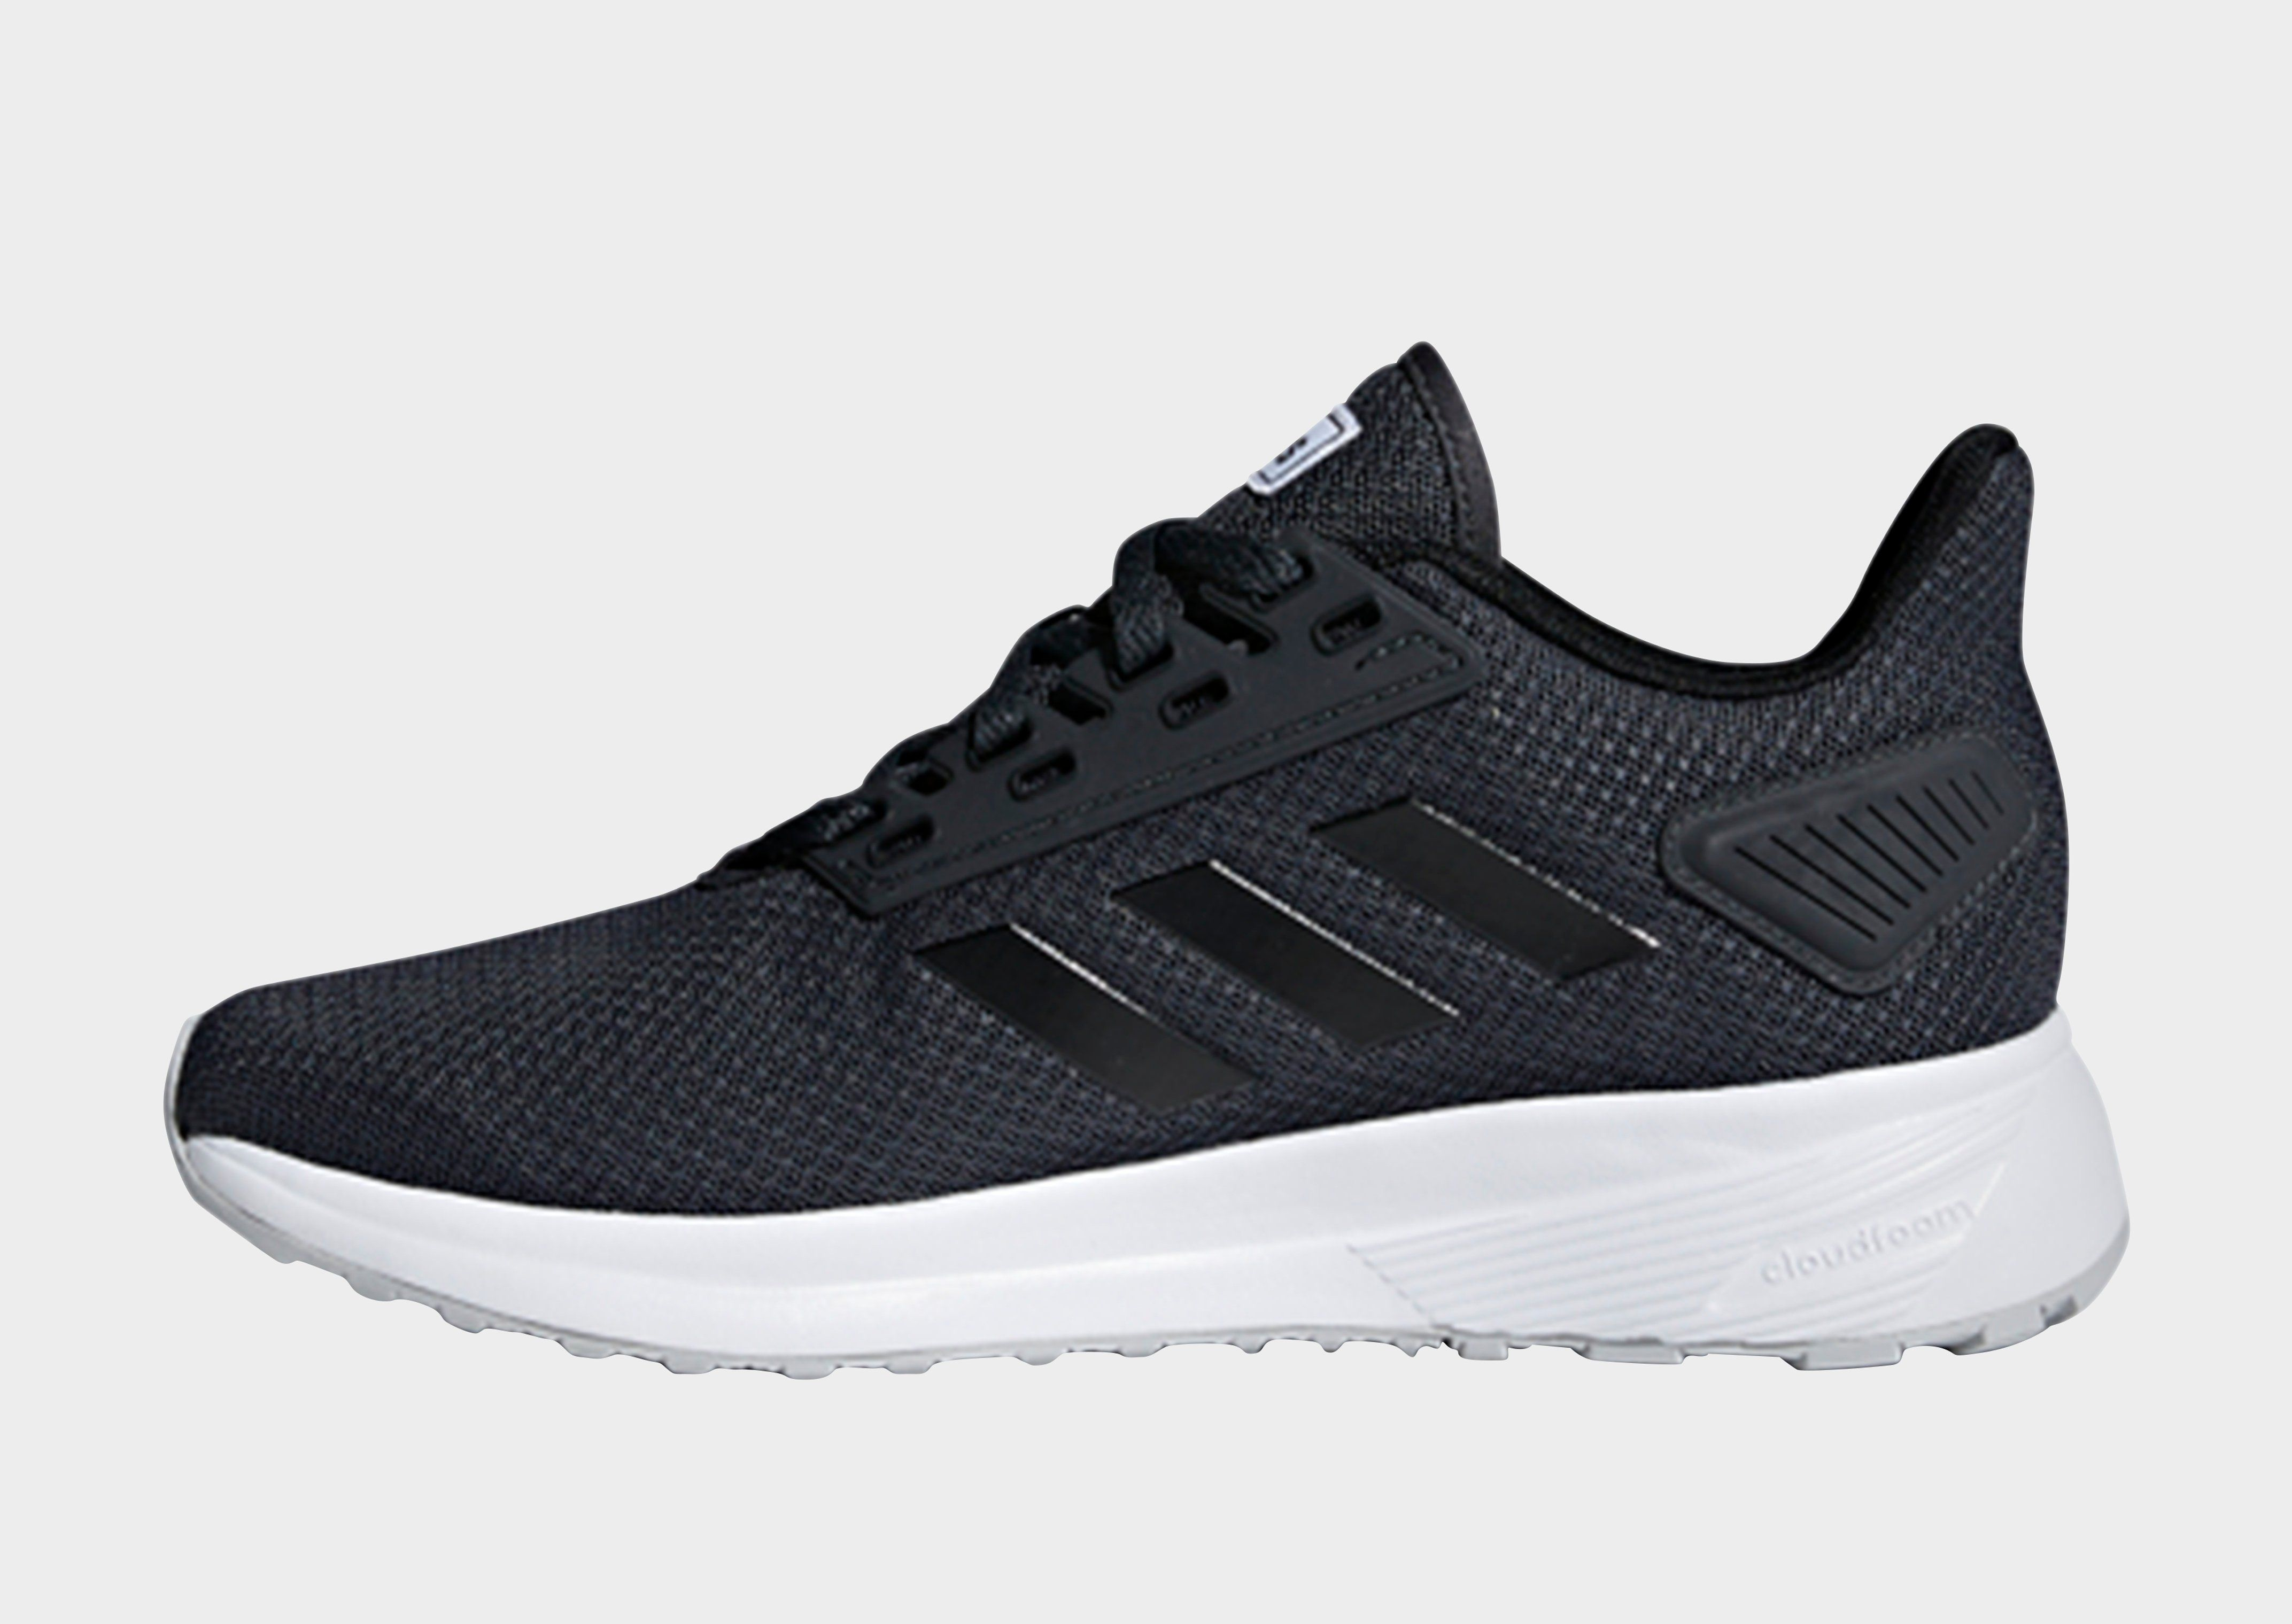 ed77768aee55 ADIDAS Duramo 9 Shoes